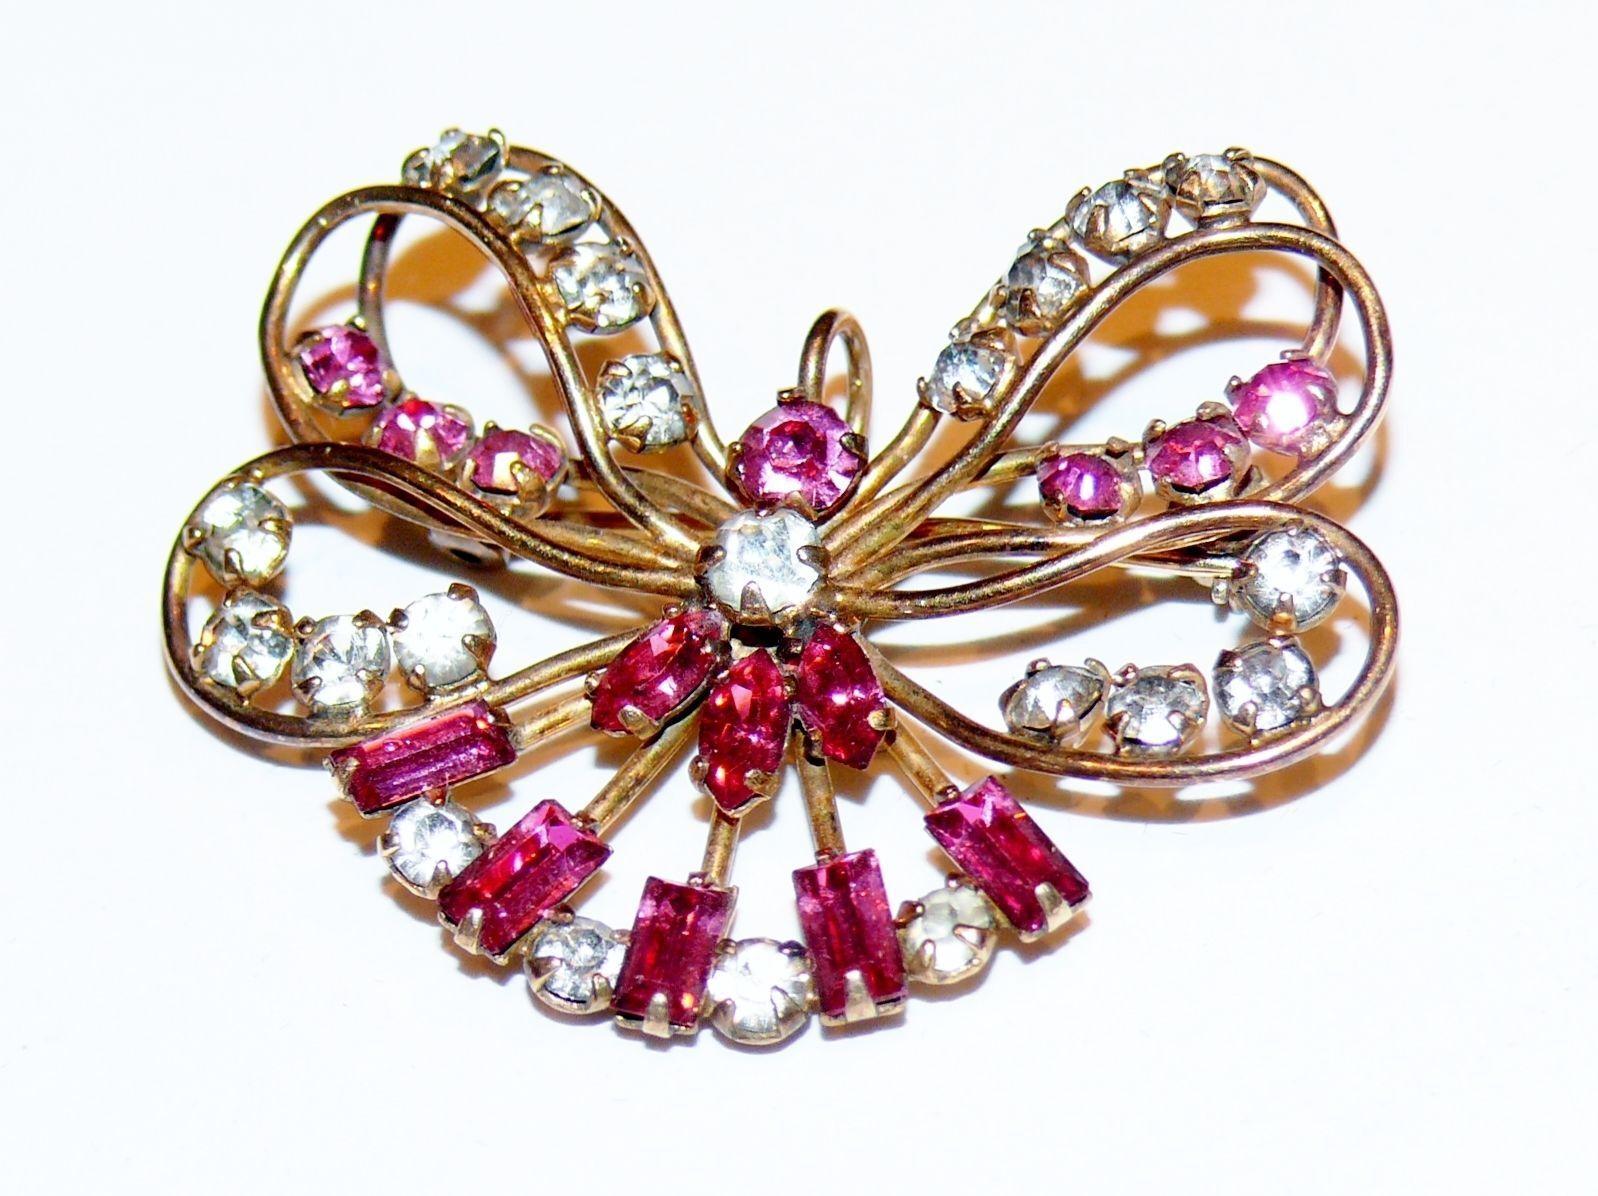 Vintage HARPER Signed 1 20 12K gold Filled Butterfly Bow Pink Rhinestone Brooch